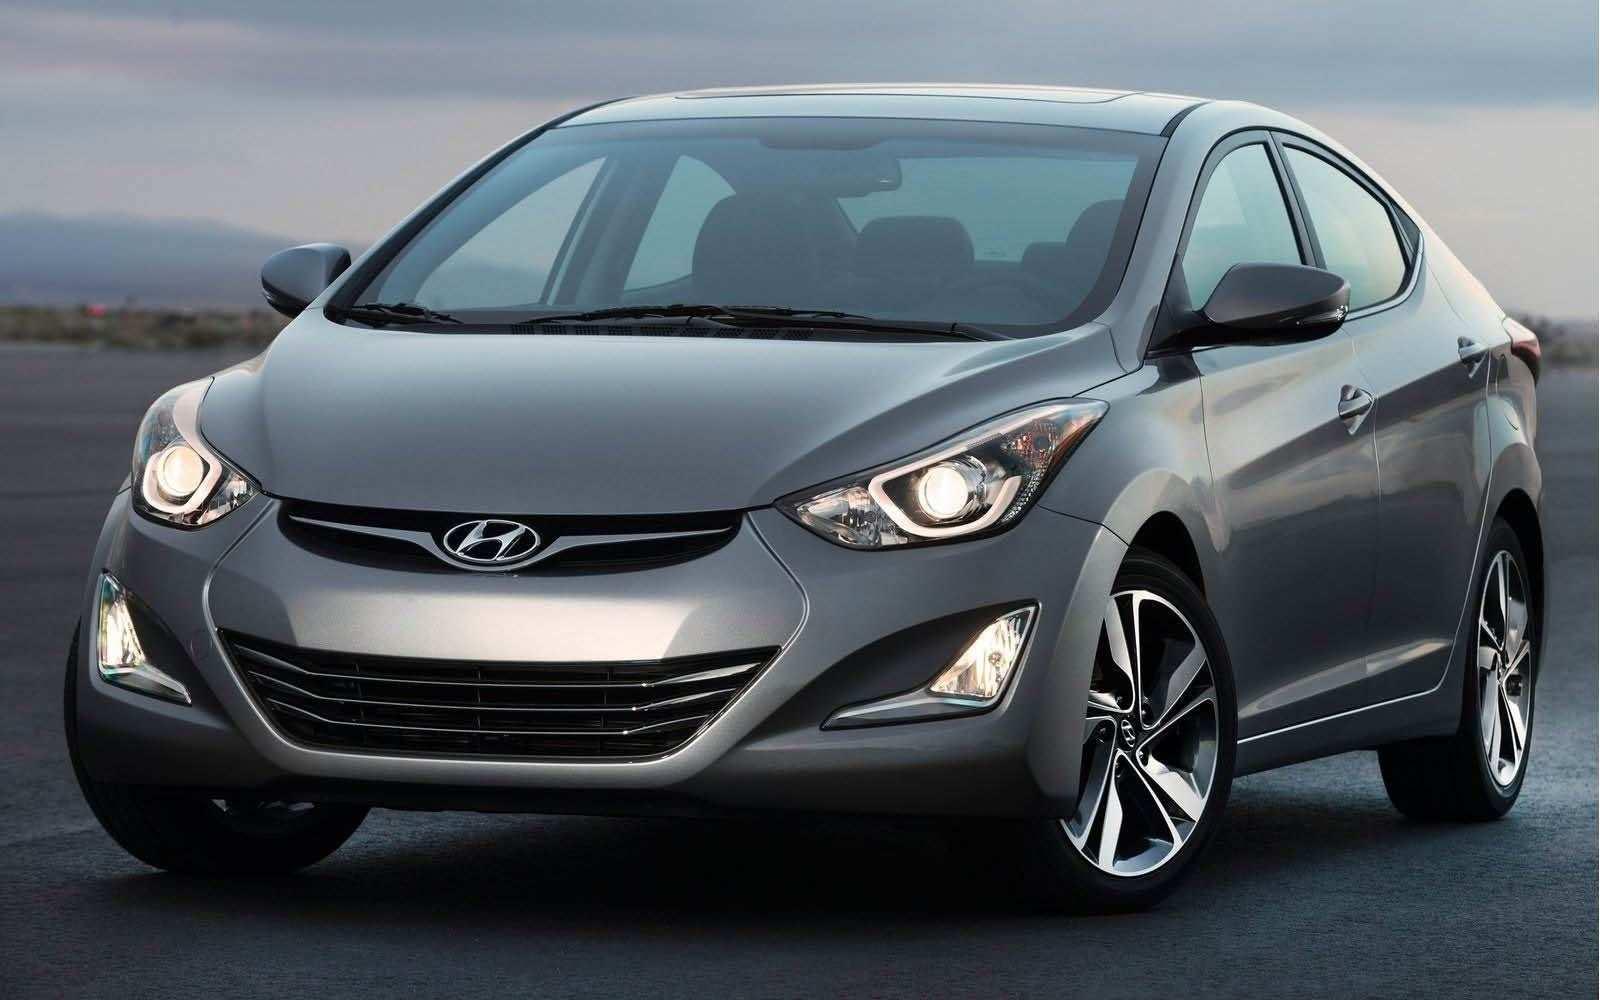 90 Concept of 2020 Hyundai Elantra Sedan Images by 2020 Hyundai Elantra Sedan